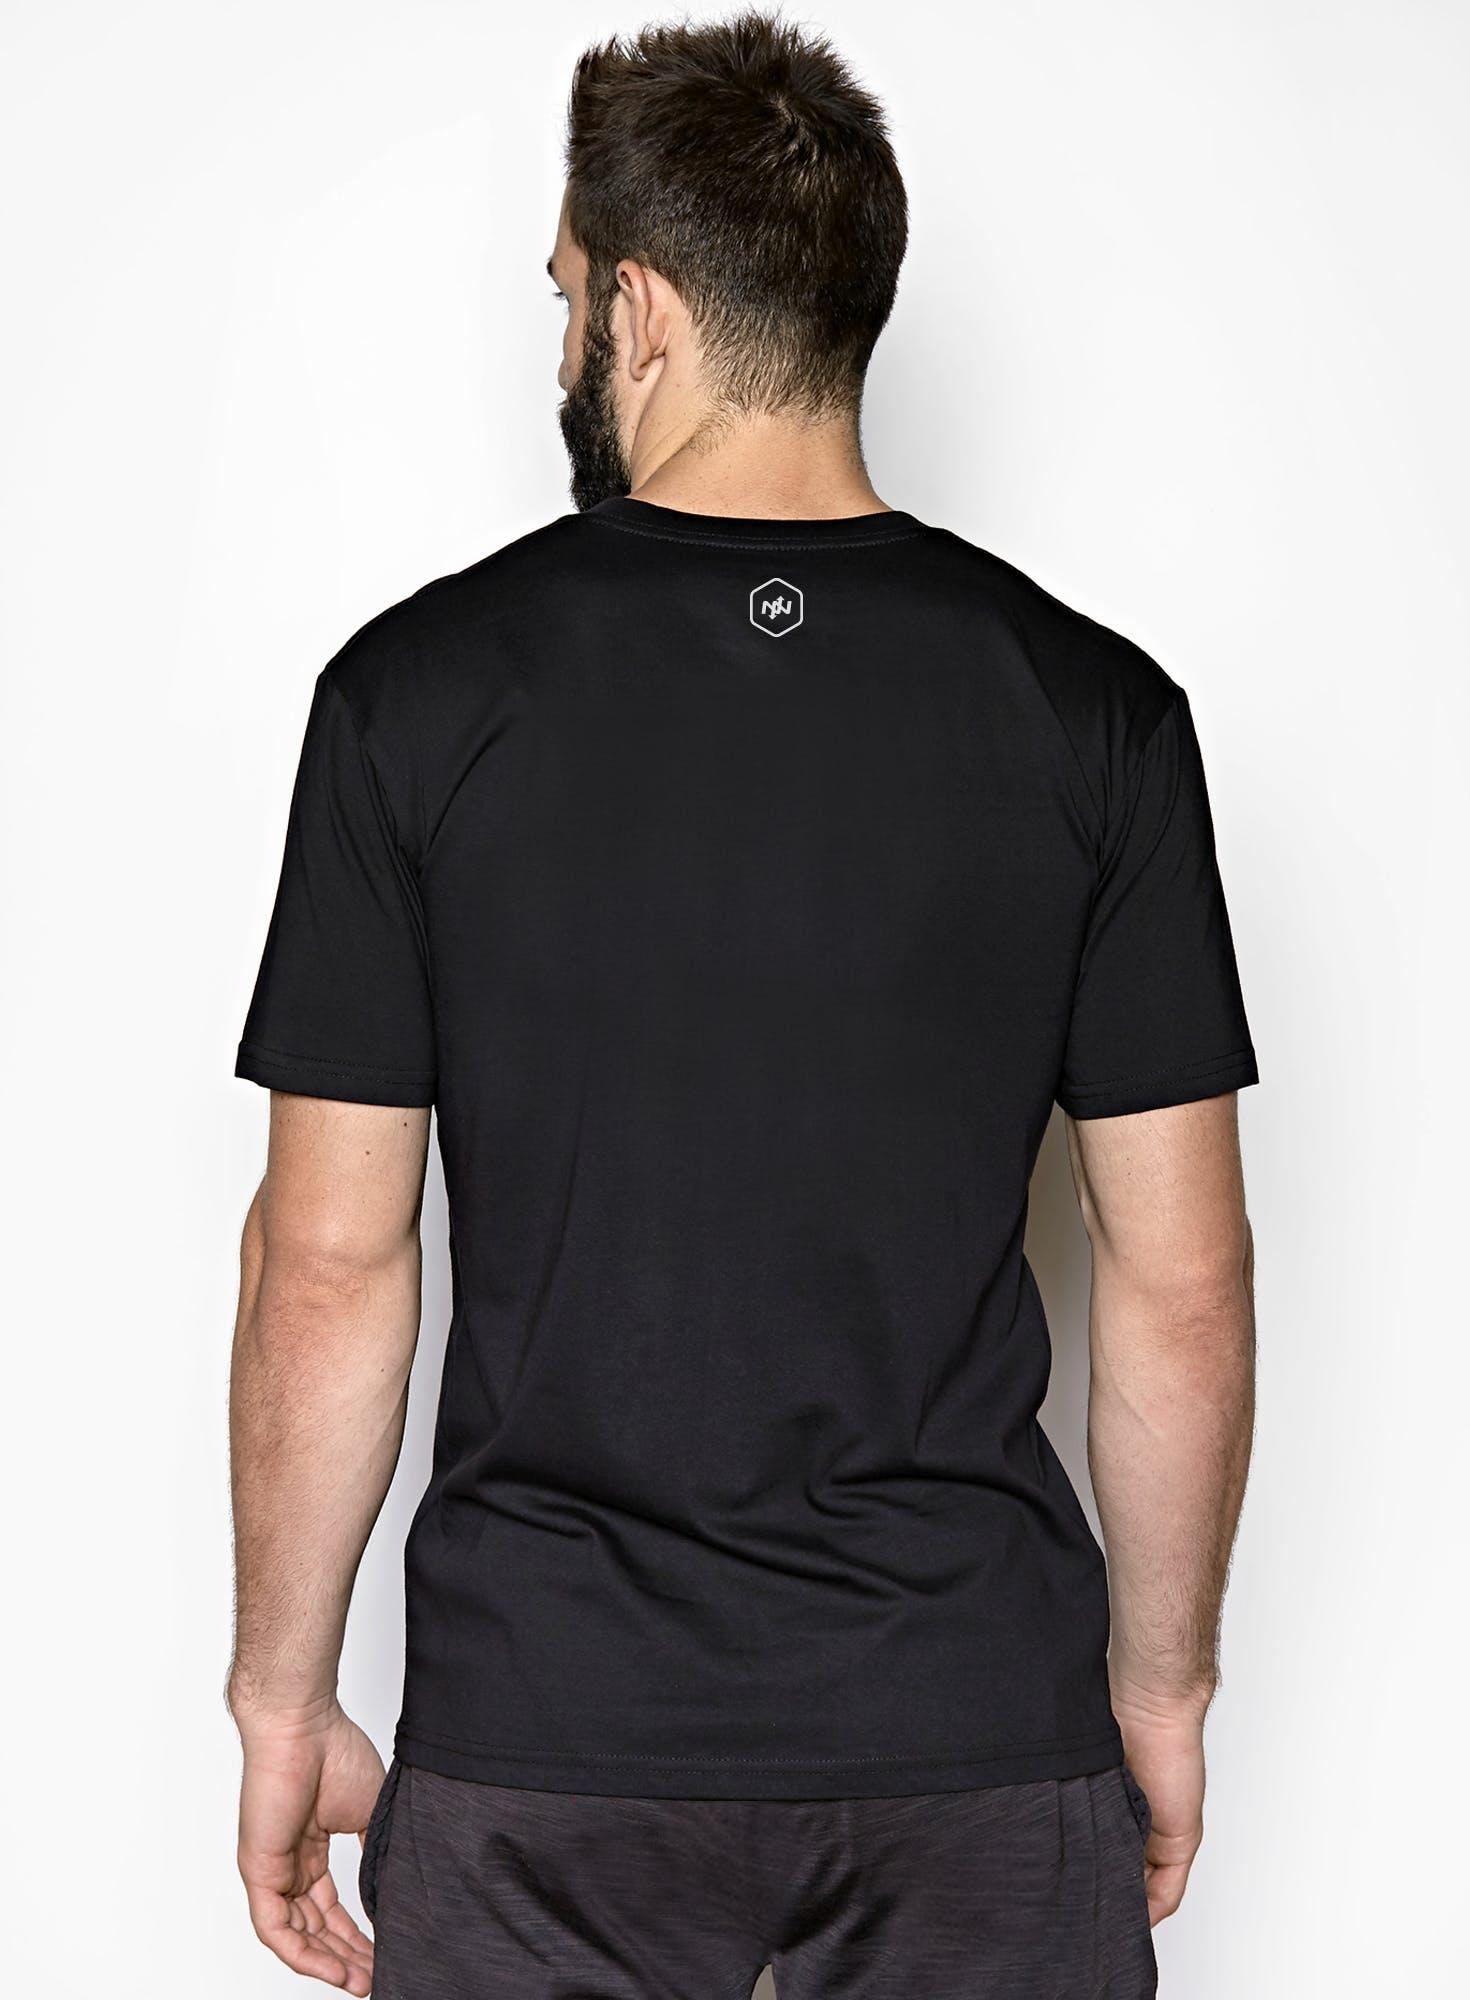 10th Planet Space Ape T-Shirt Bonus Image